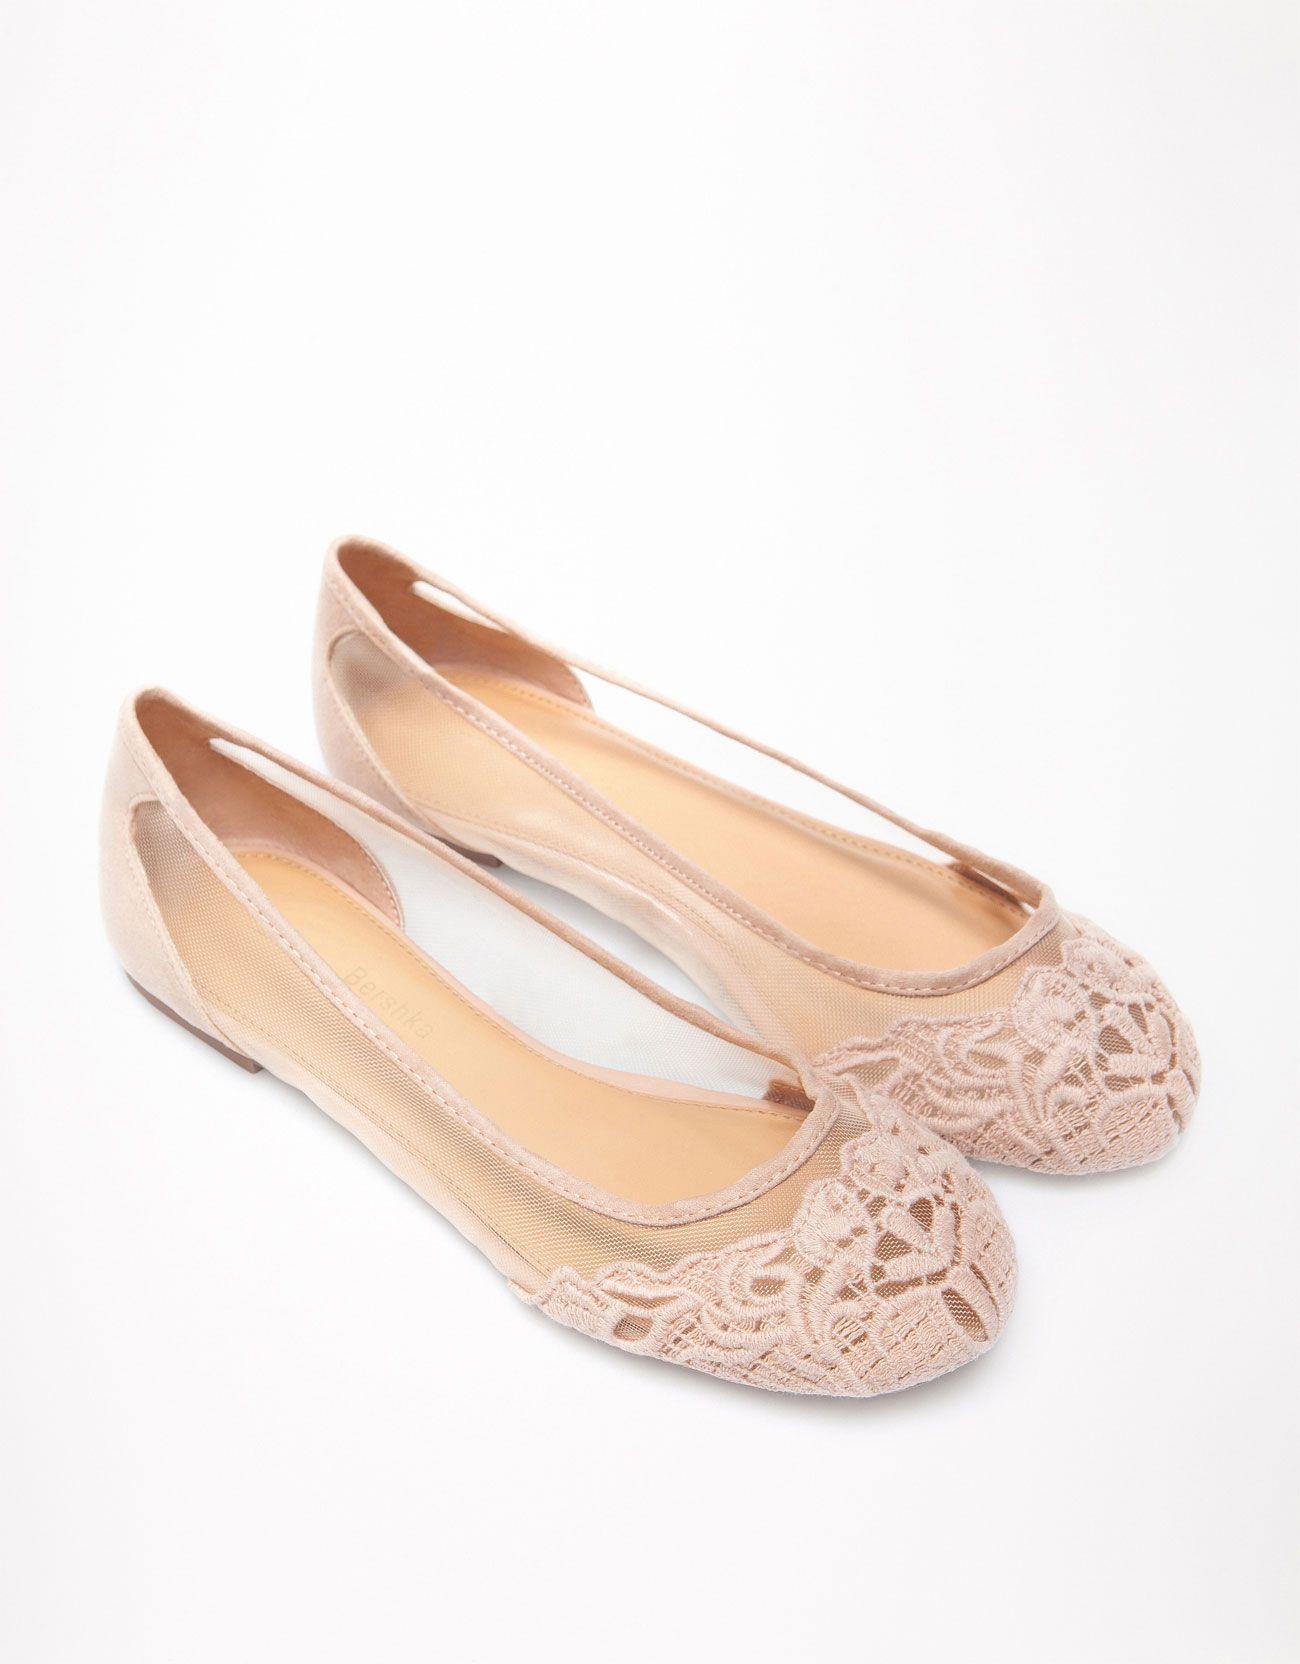 lace ballerina pumps